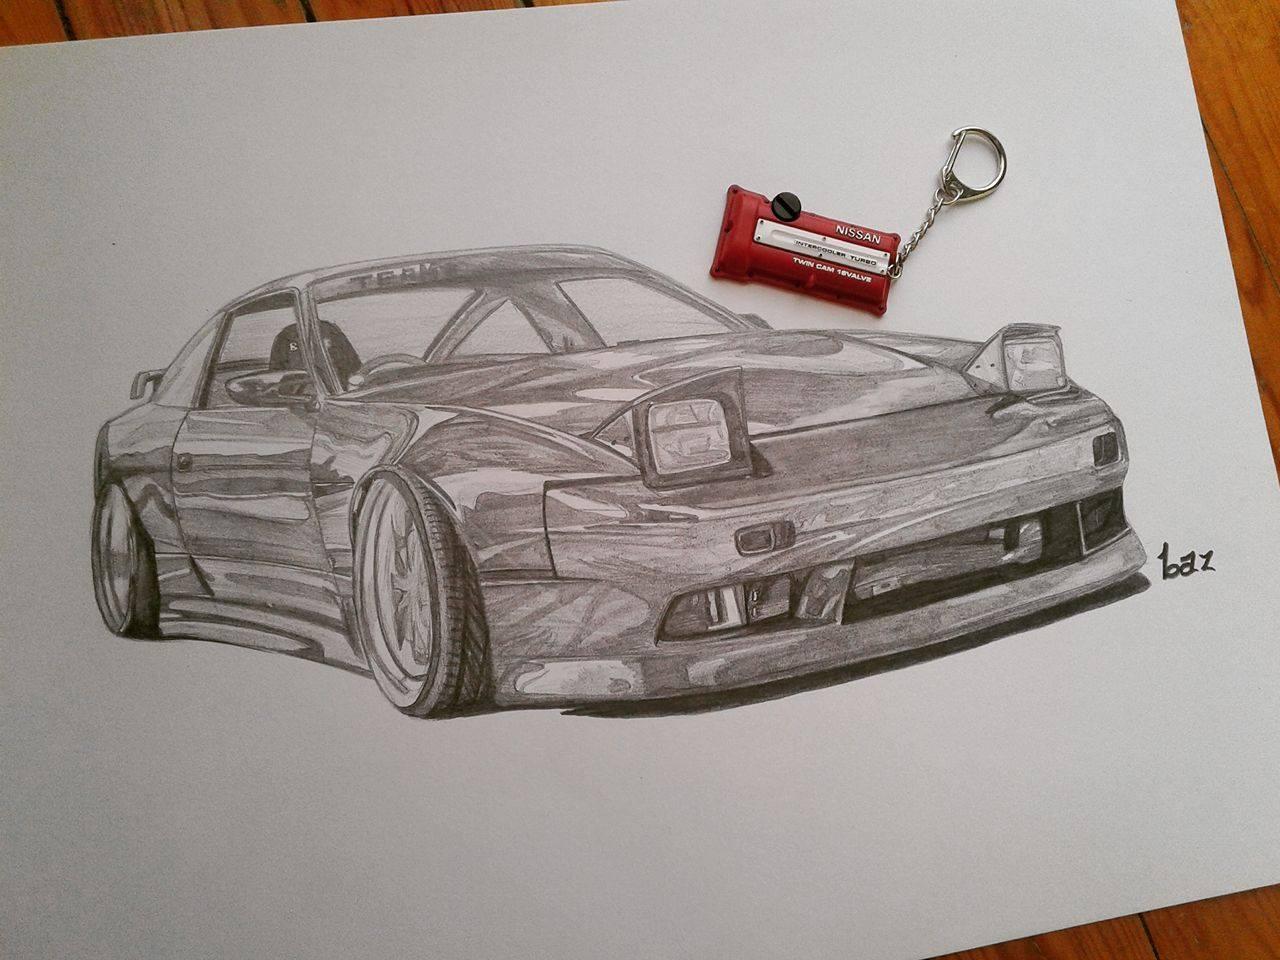 Nissan 180sx Drawing Car Throttle Sr20det Keychain 1500 Ish Hp